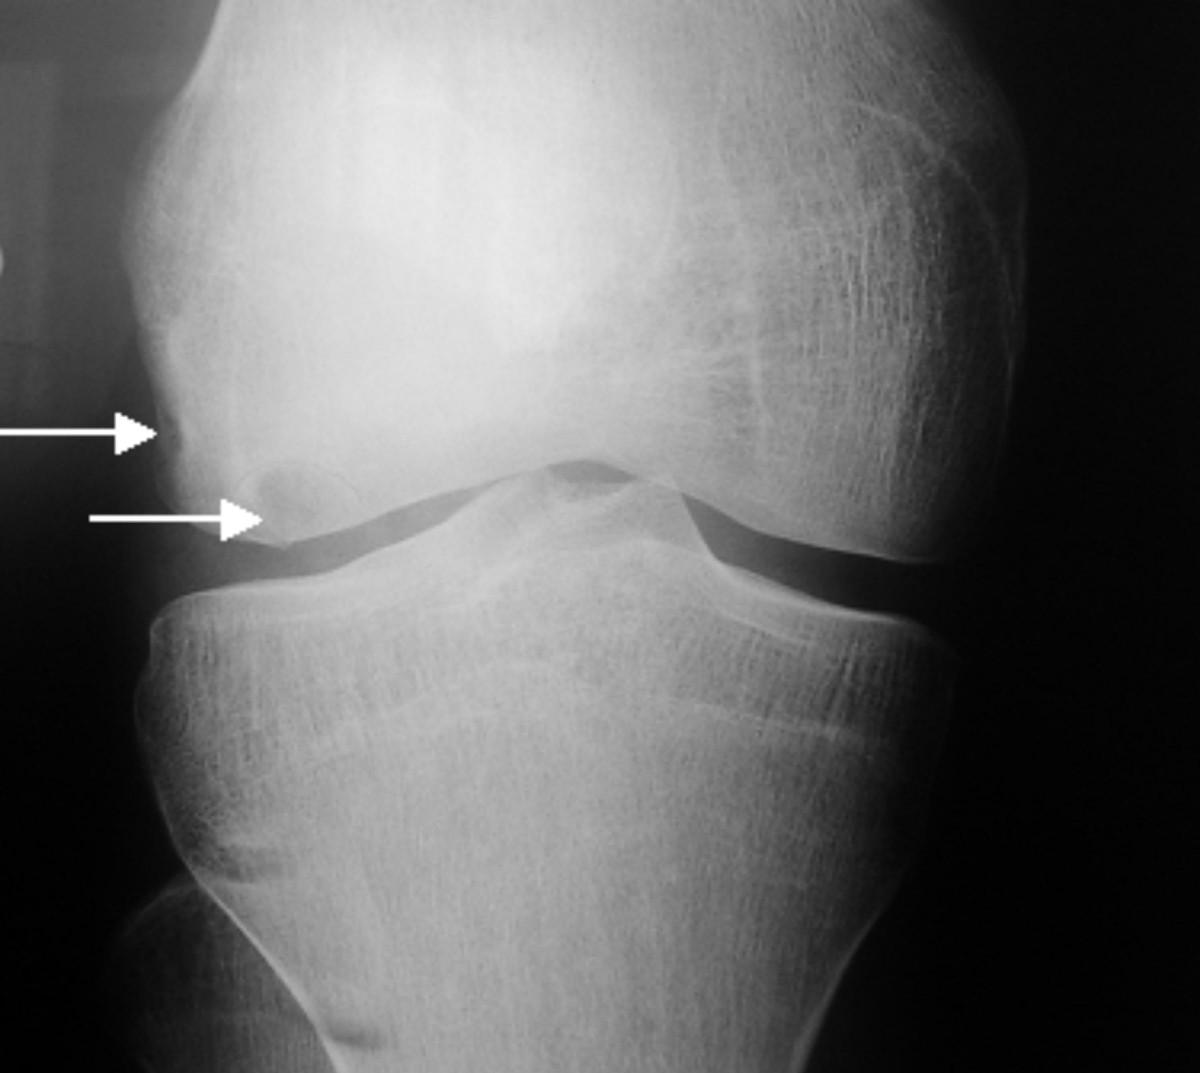 osteocondrite dissecante1.jpg